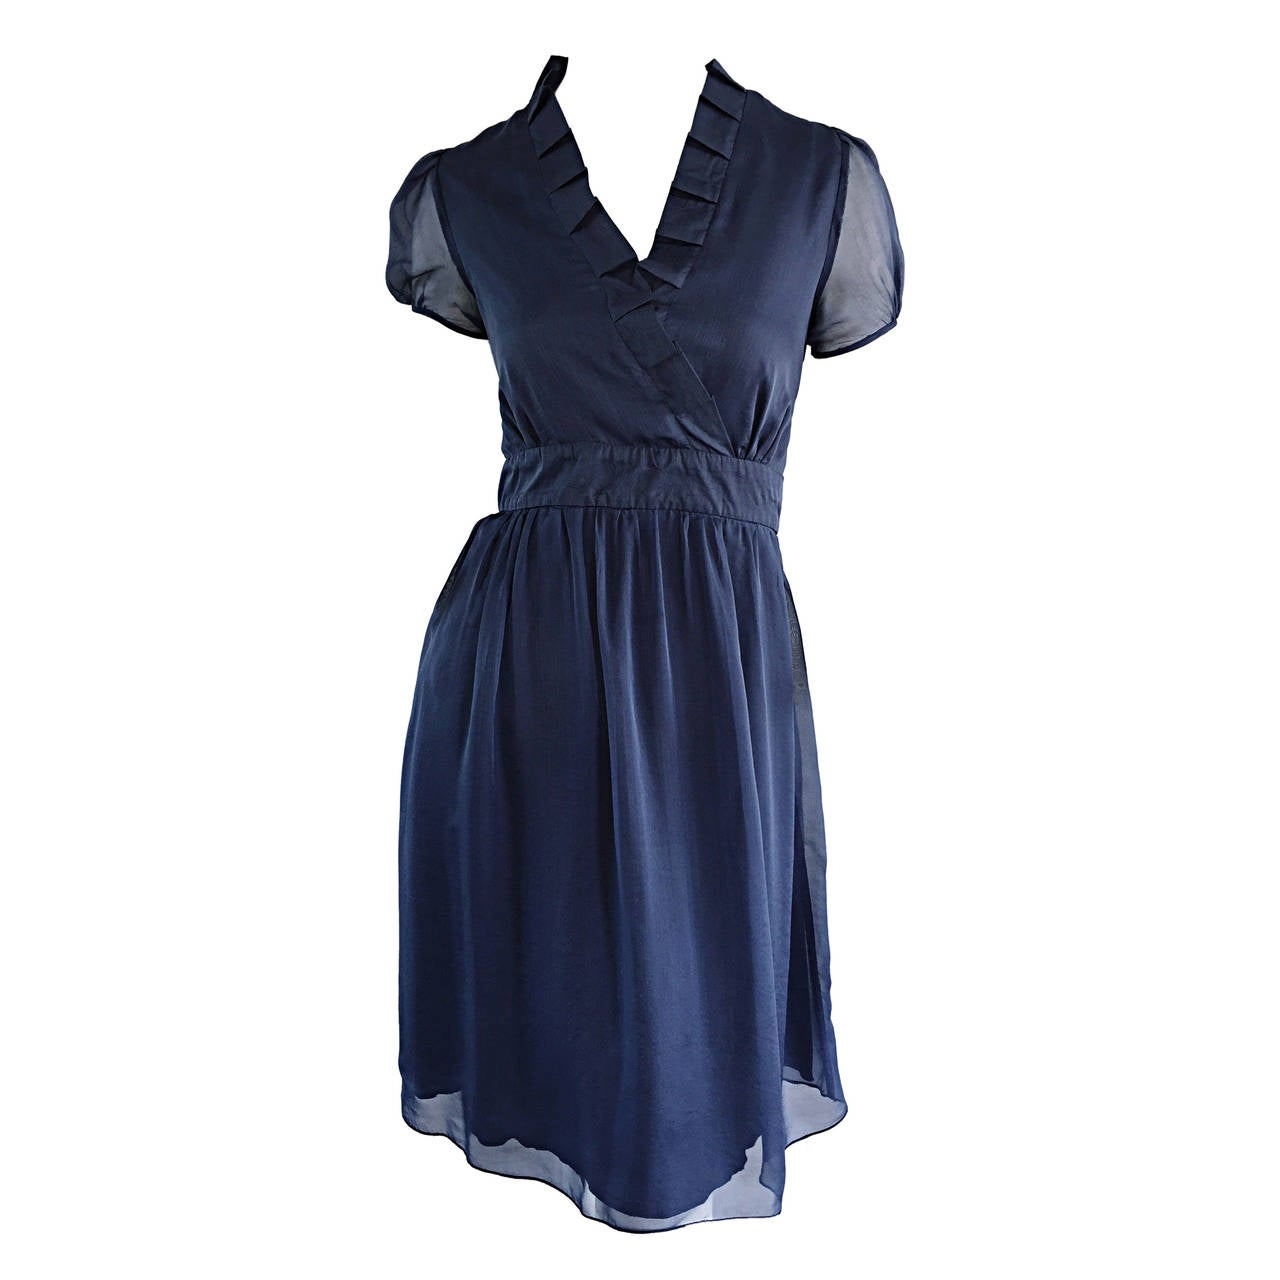 803944ab10 1990s Chloe by Karl Lagerfeld Vintage 90s Navy Blue Silk Chiffon Babydoll  Dress For Sale